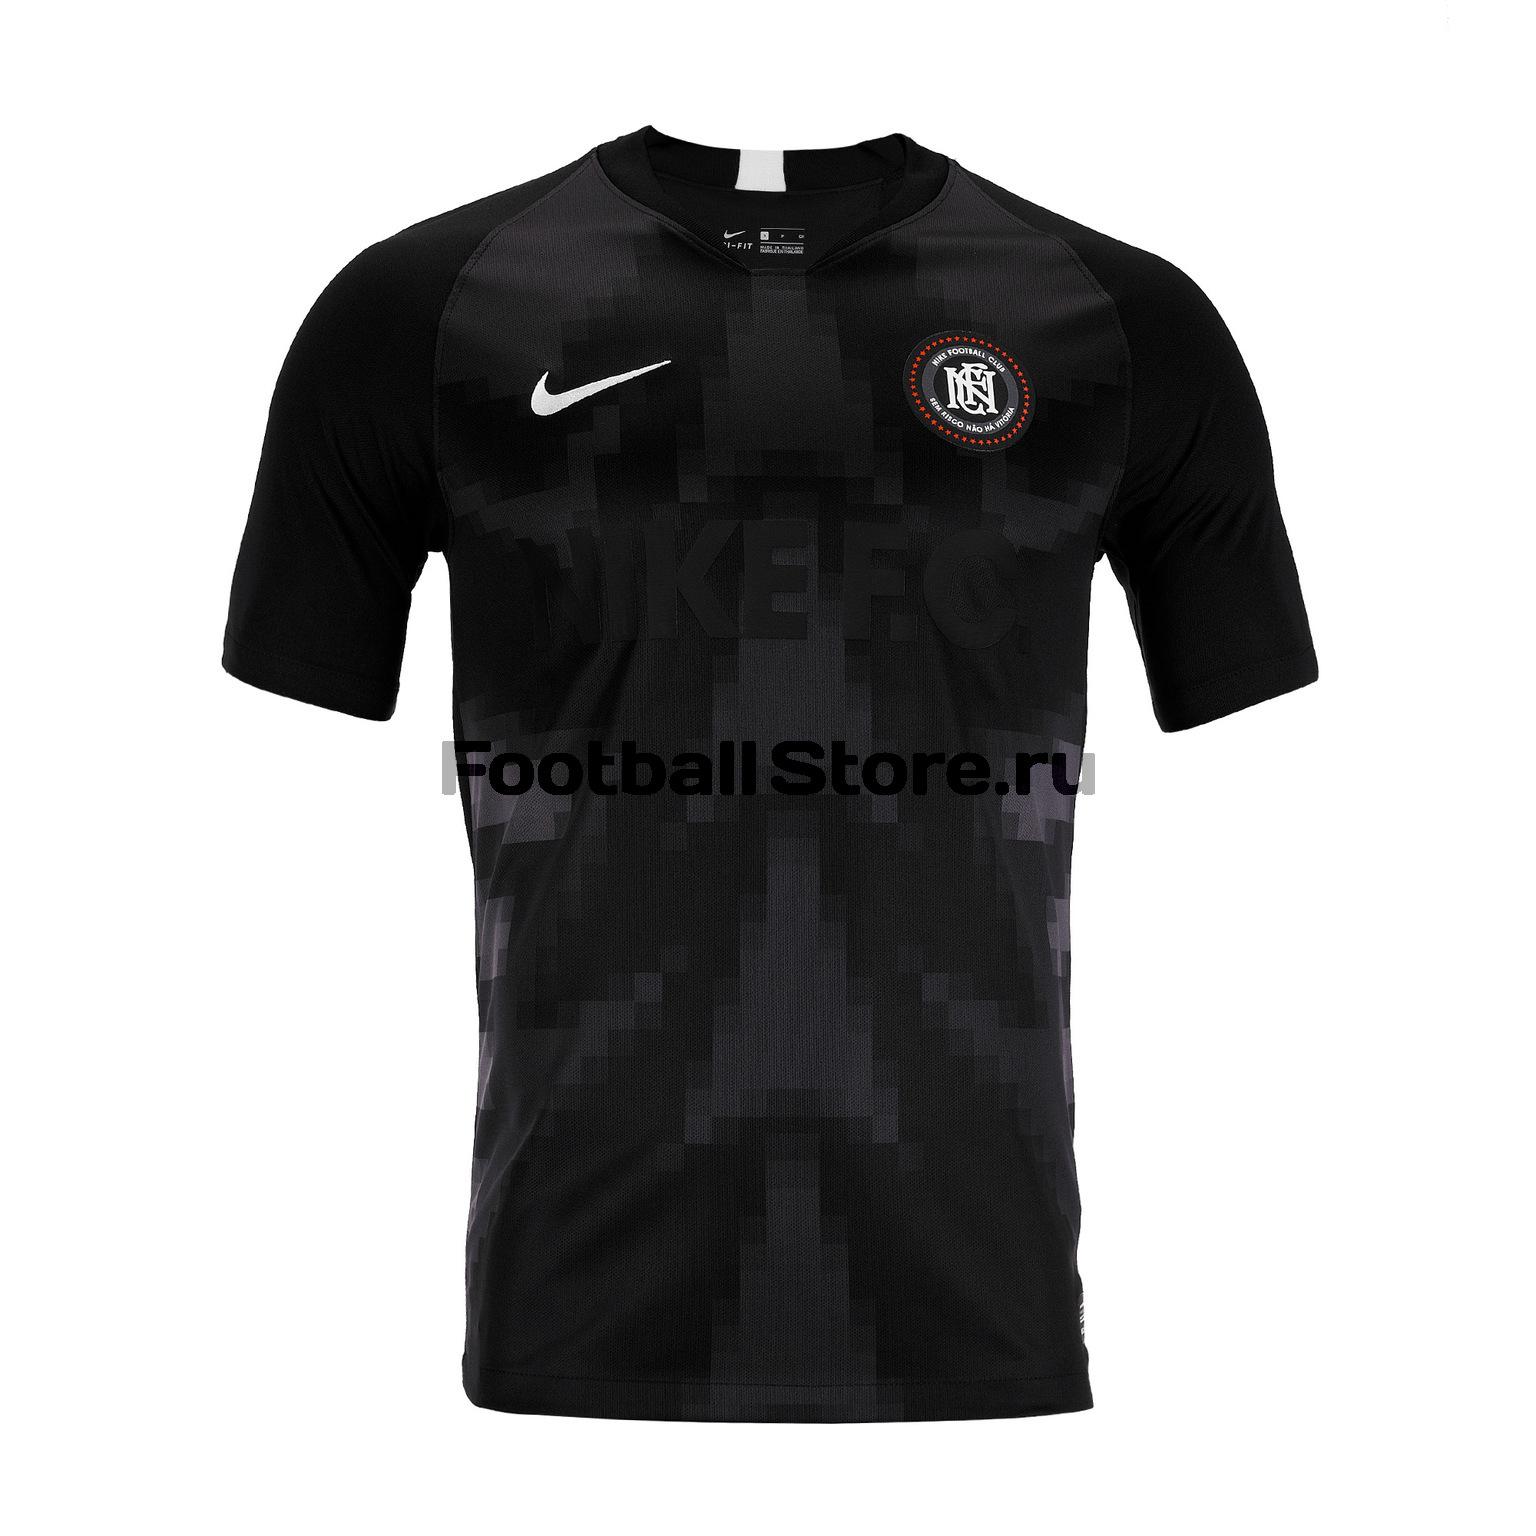 Футболка Nike F.C.Home AO0666-010 брендовая одежда